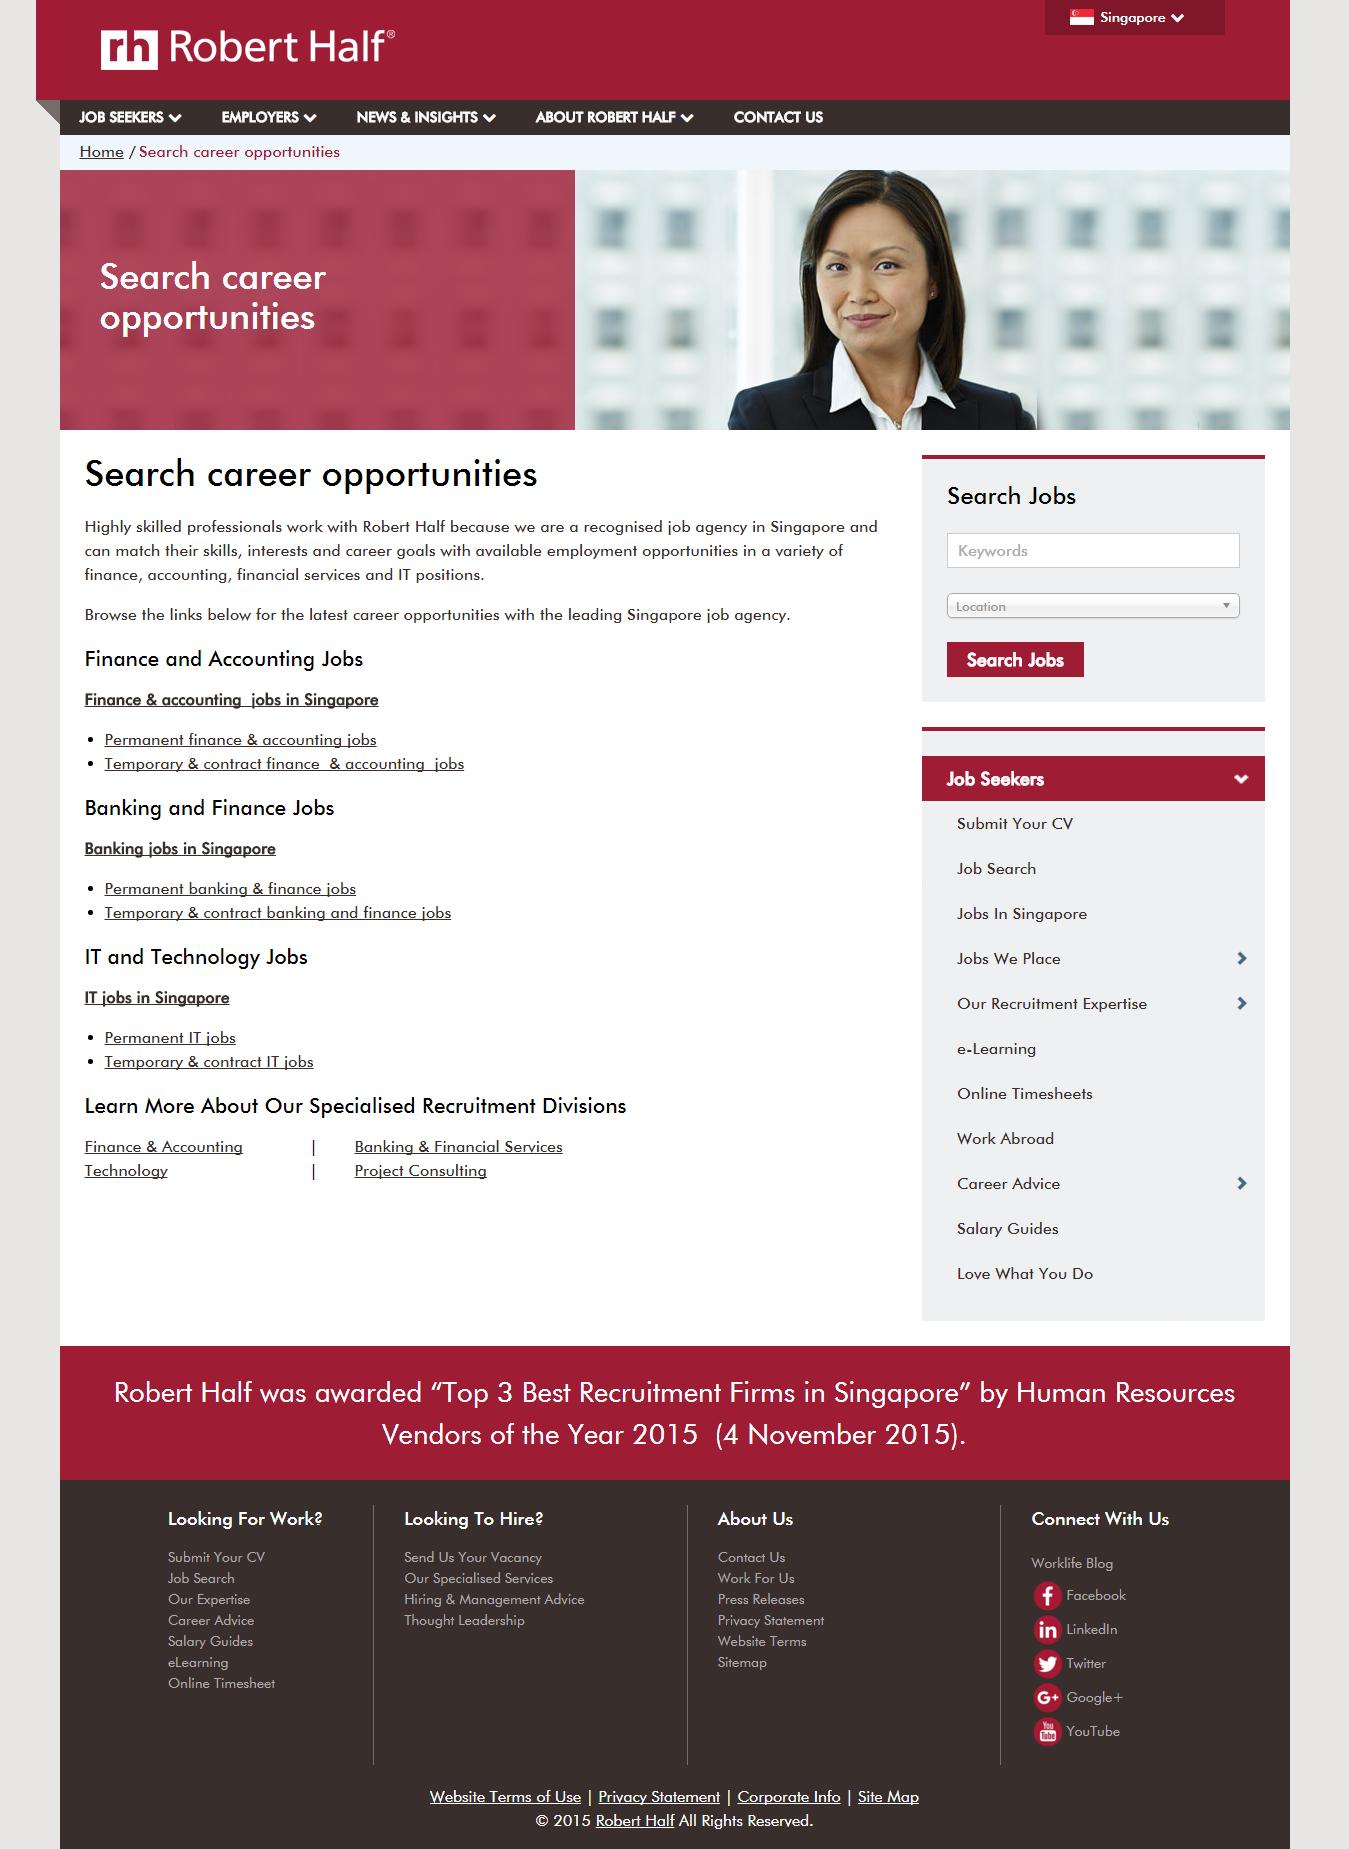 Website Design Proposal Template Nice Website Templates Design Proposal For Adecco Singapore